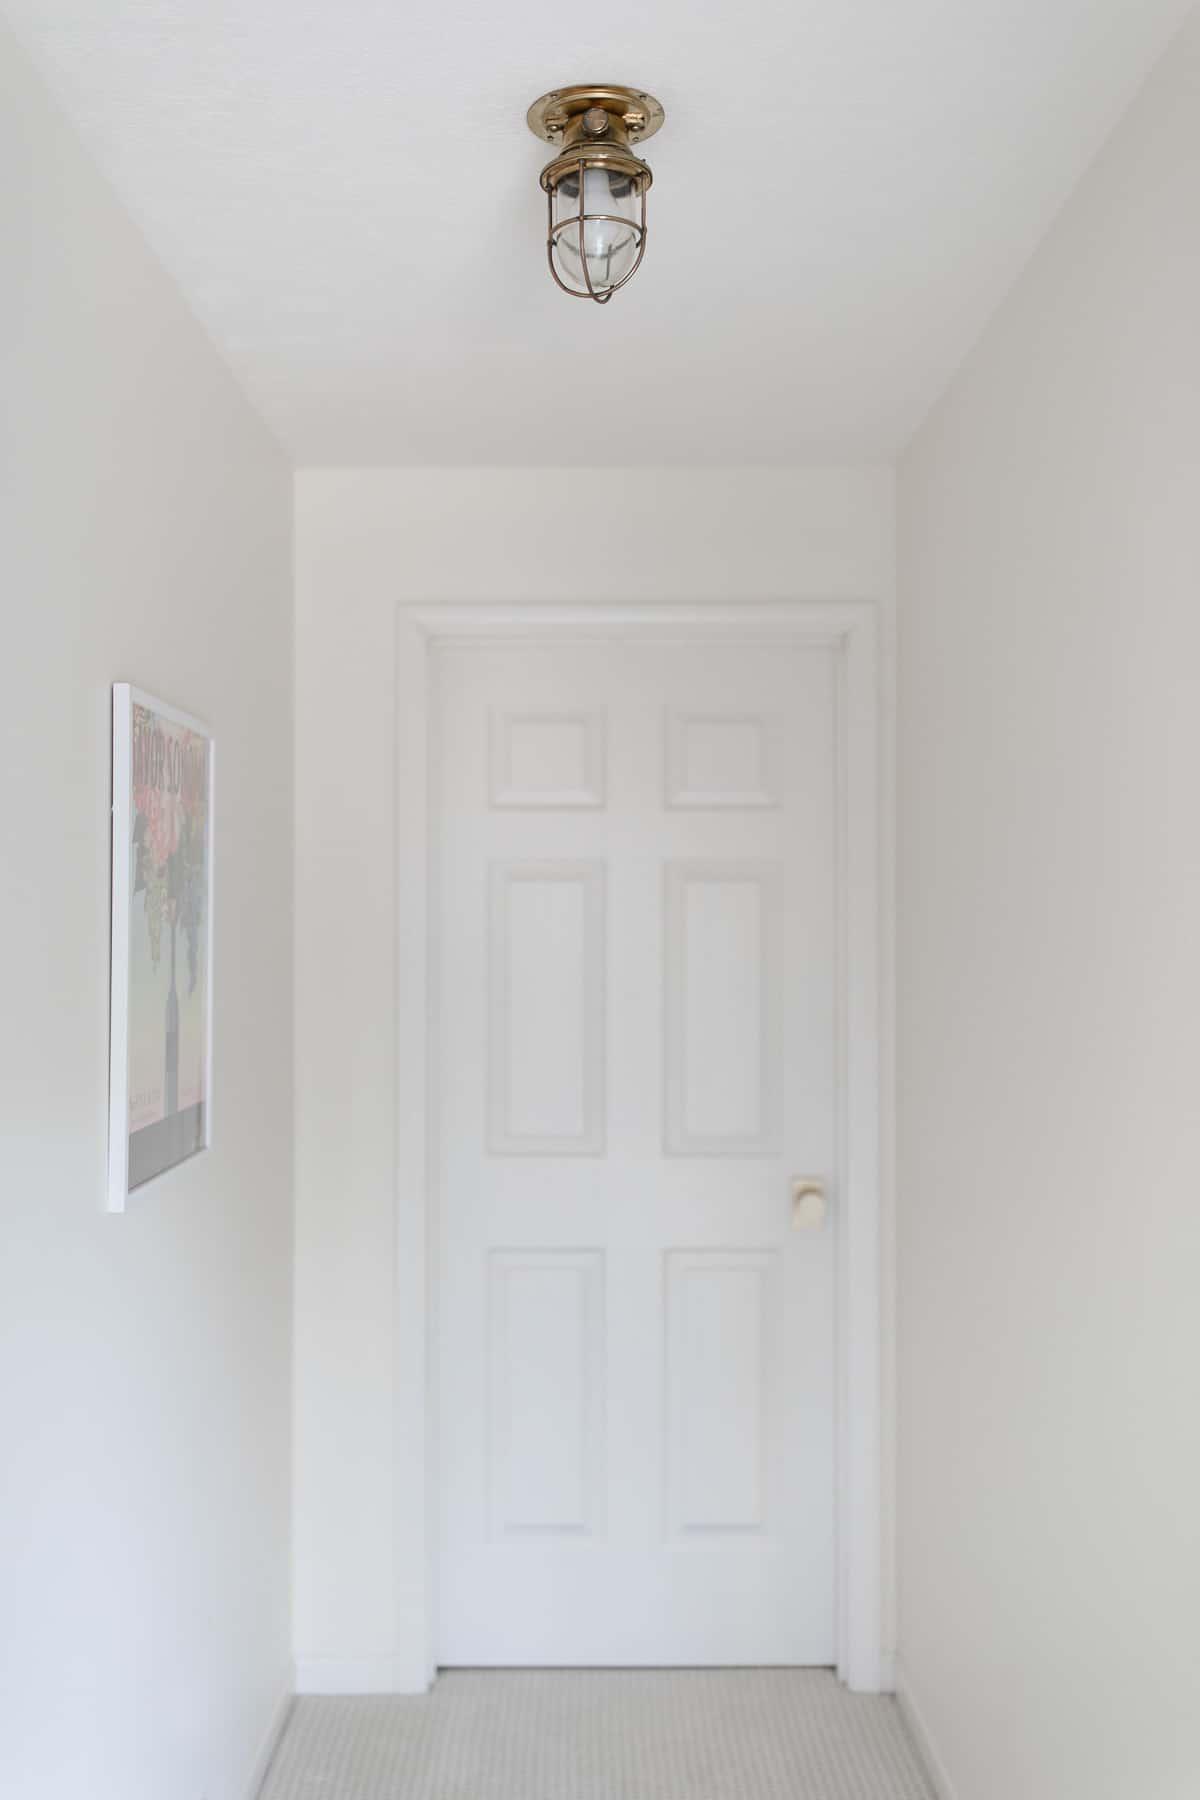 brass nautical light in hall